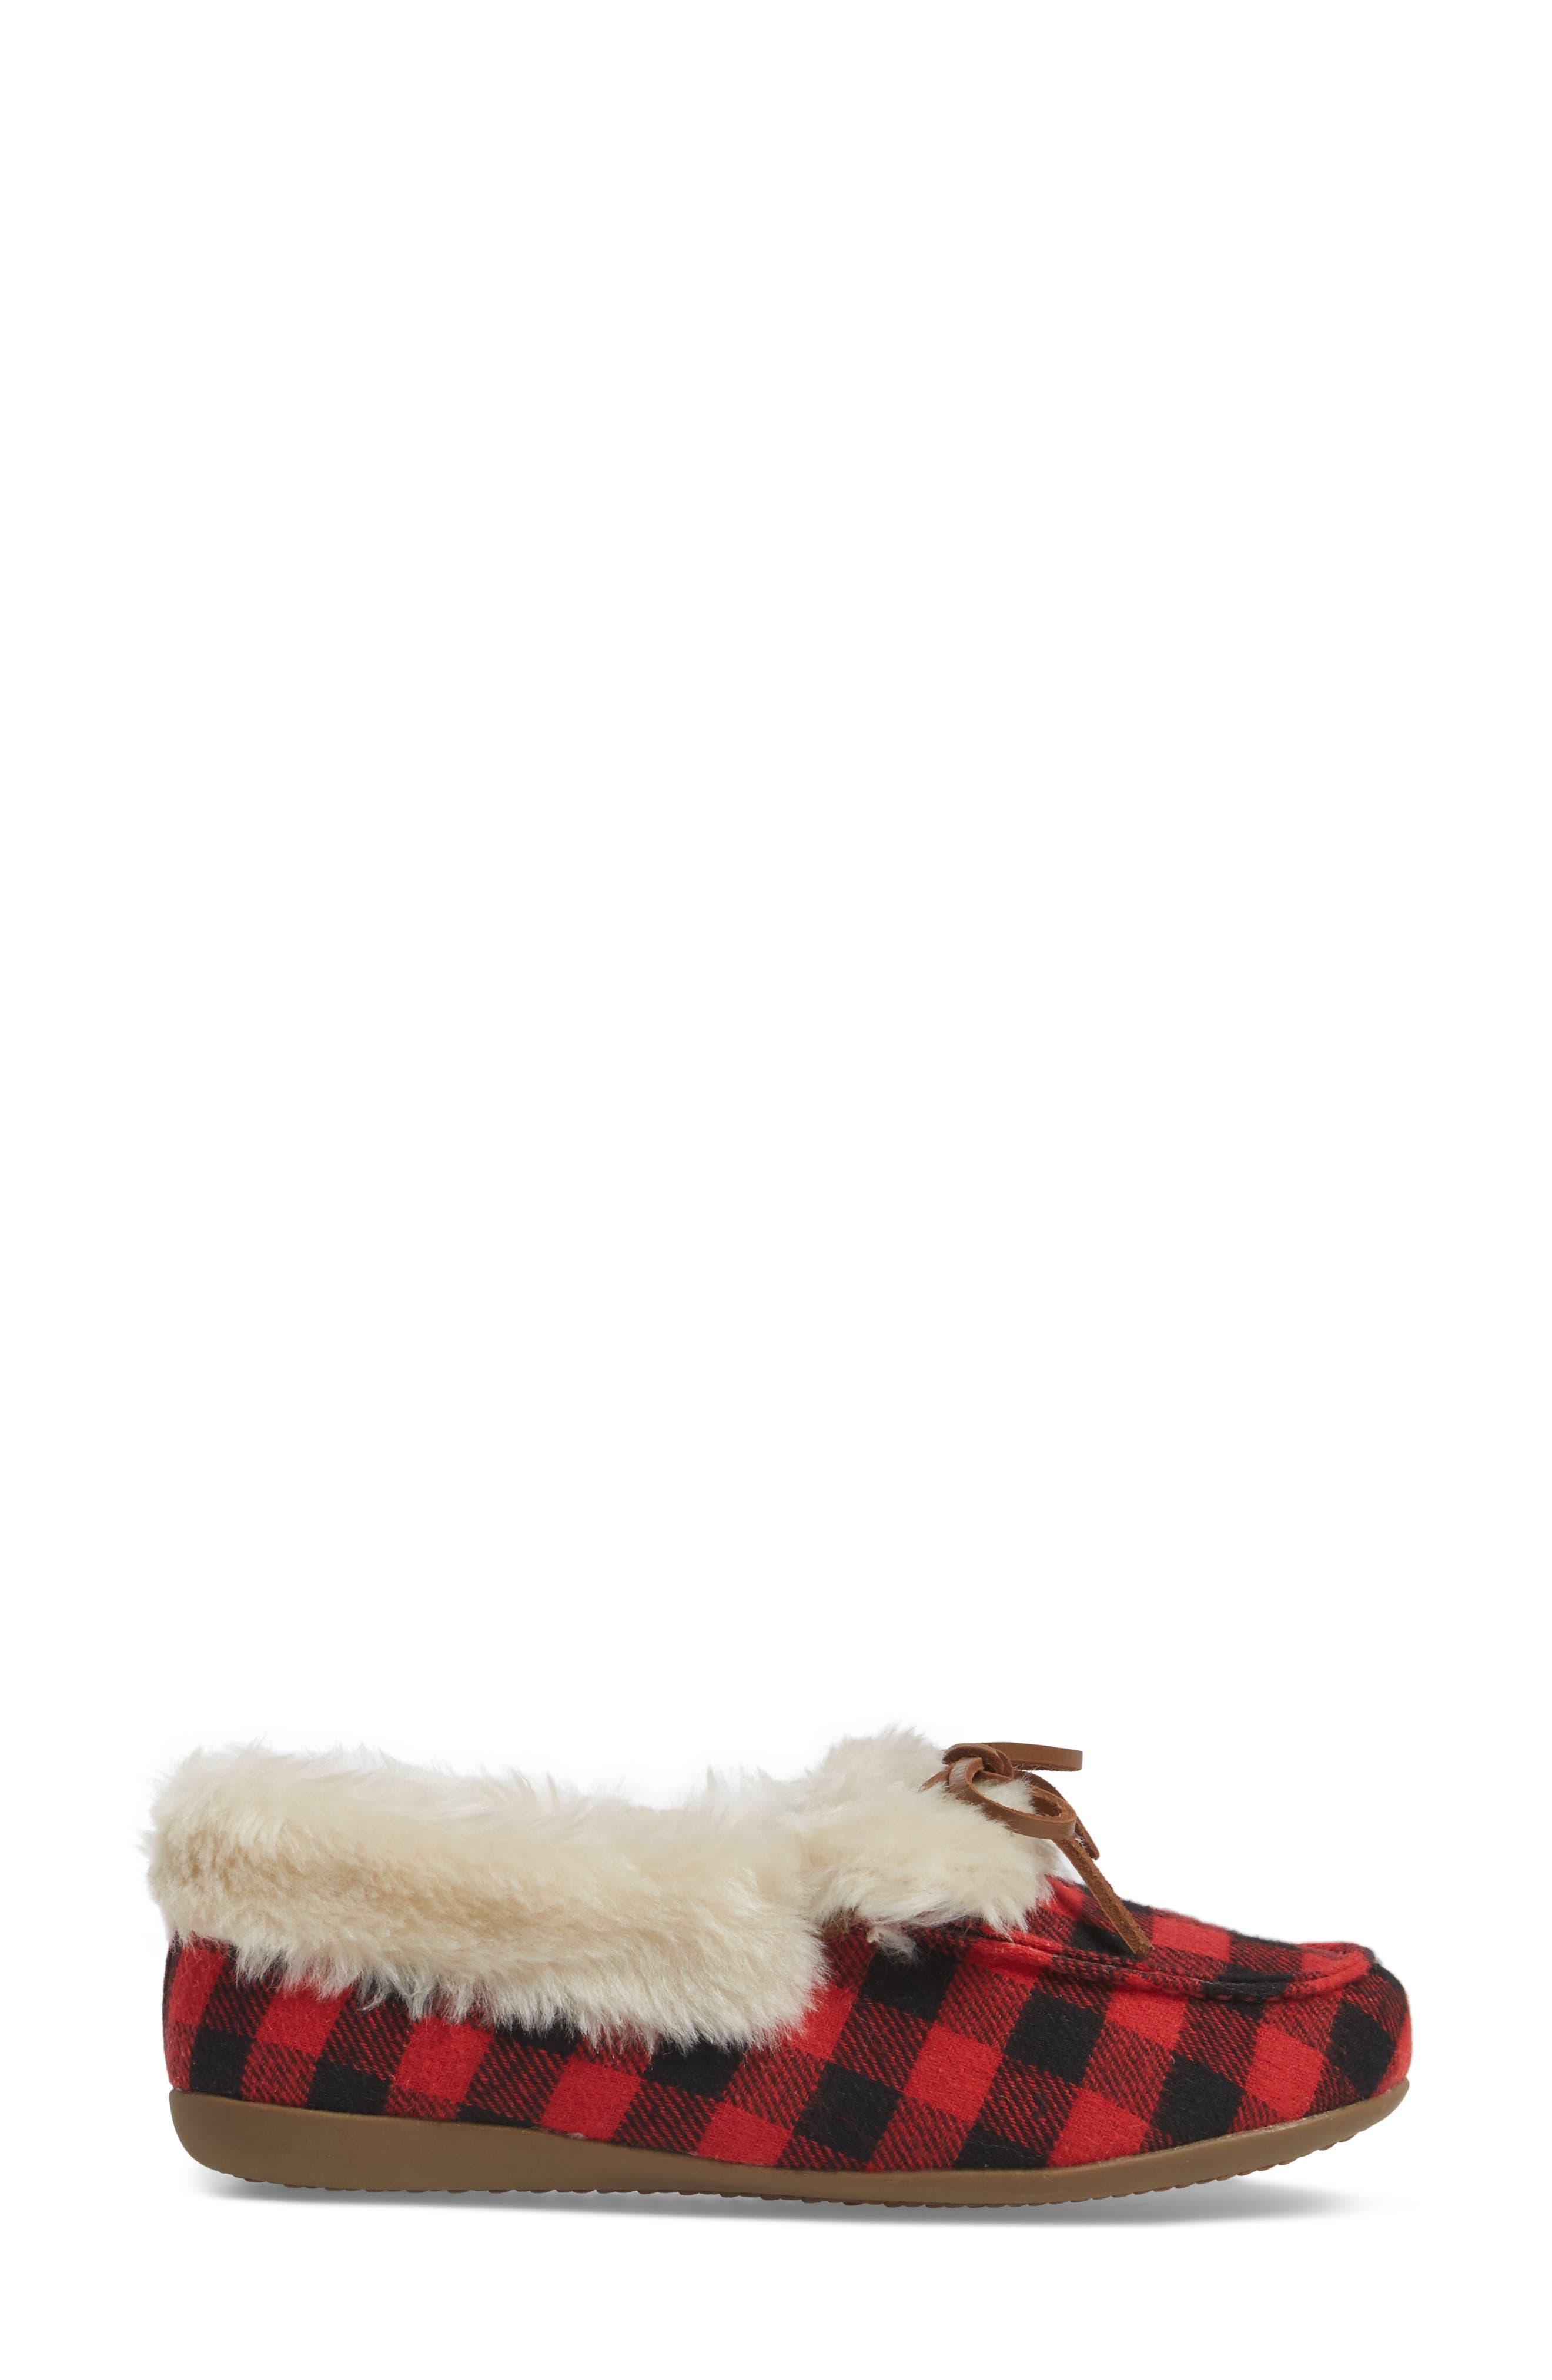 Juniper Faux Fur Slipper,                             Alternate thumbnail 3, color,                             Black Red Textile